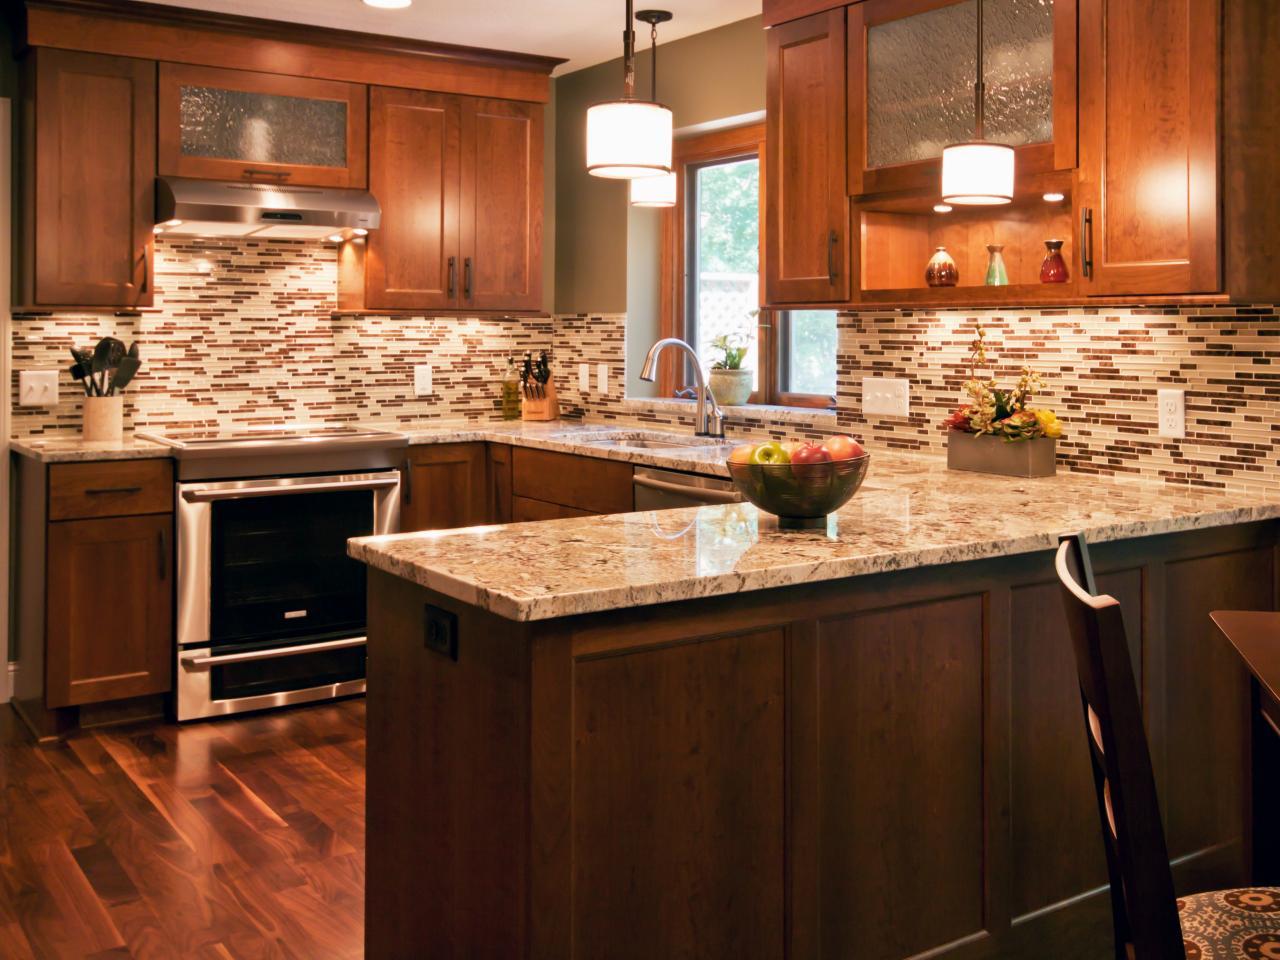 Mosaic tile kitchen backsplash.